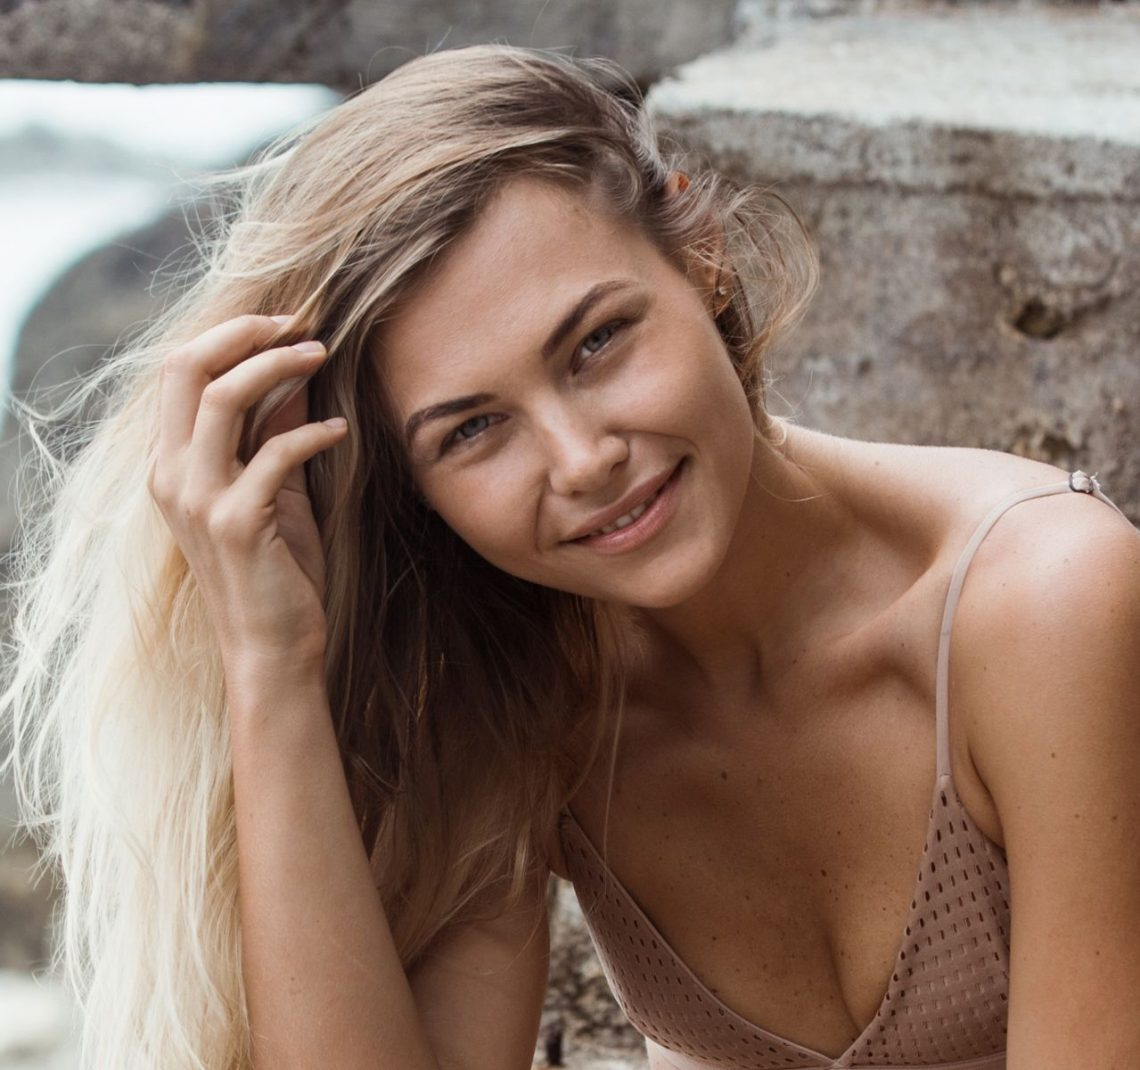 Balistarz-model-Olya-Nechiporenko-smiling-natural-portrait-outdoor